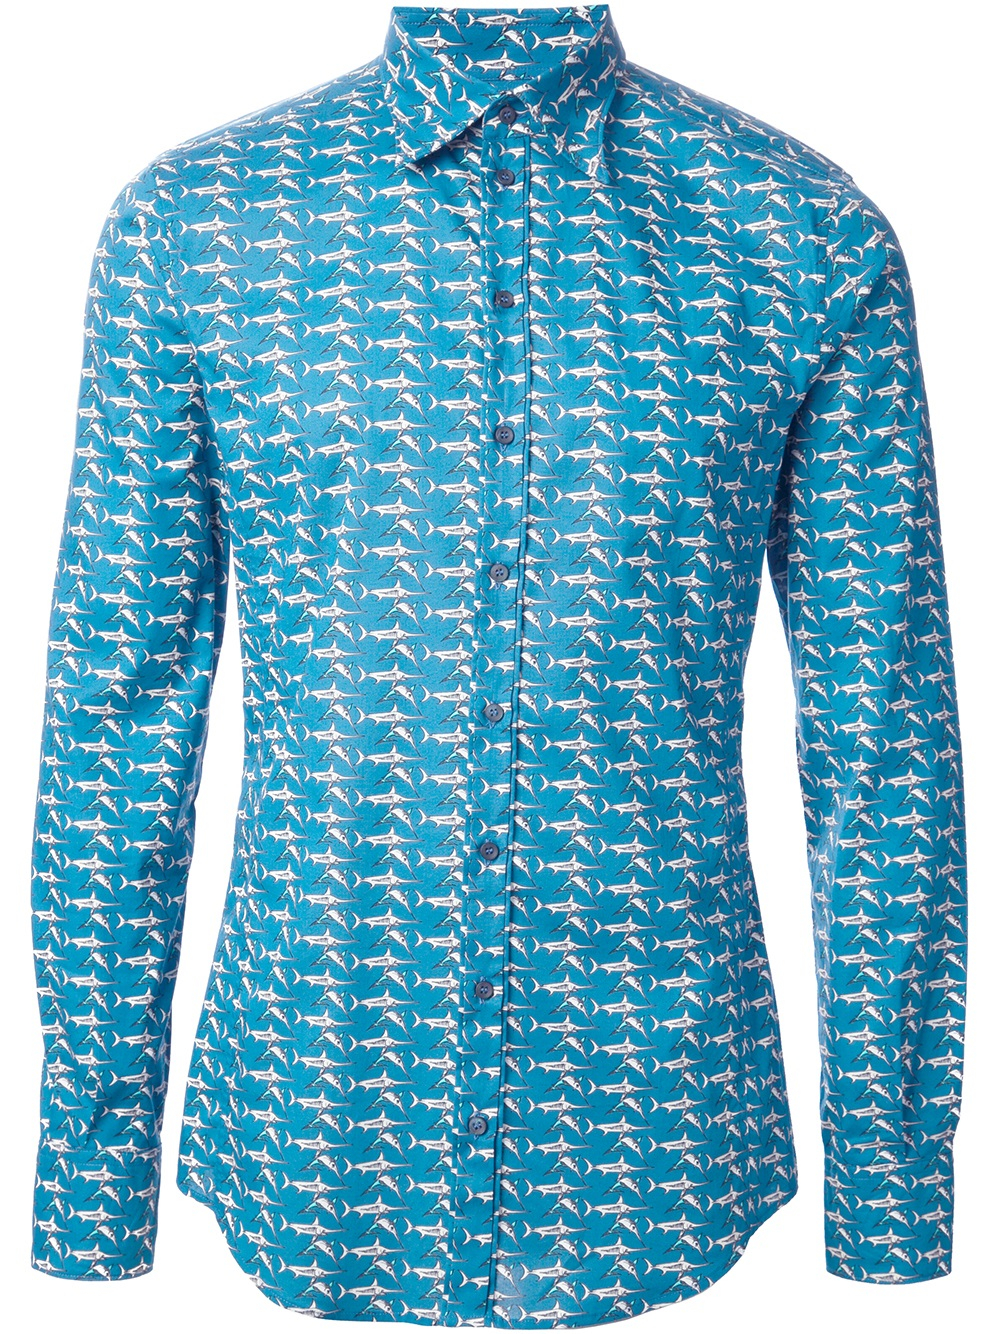 Dolce gabbana sword fish print shirt in blue for men lyst for Fish print shirt